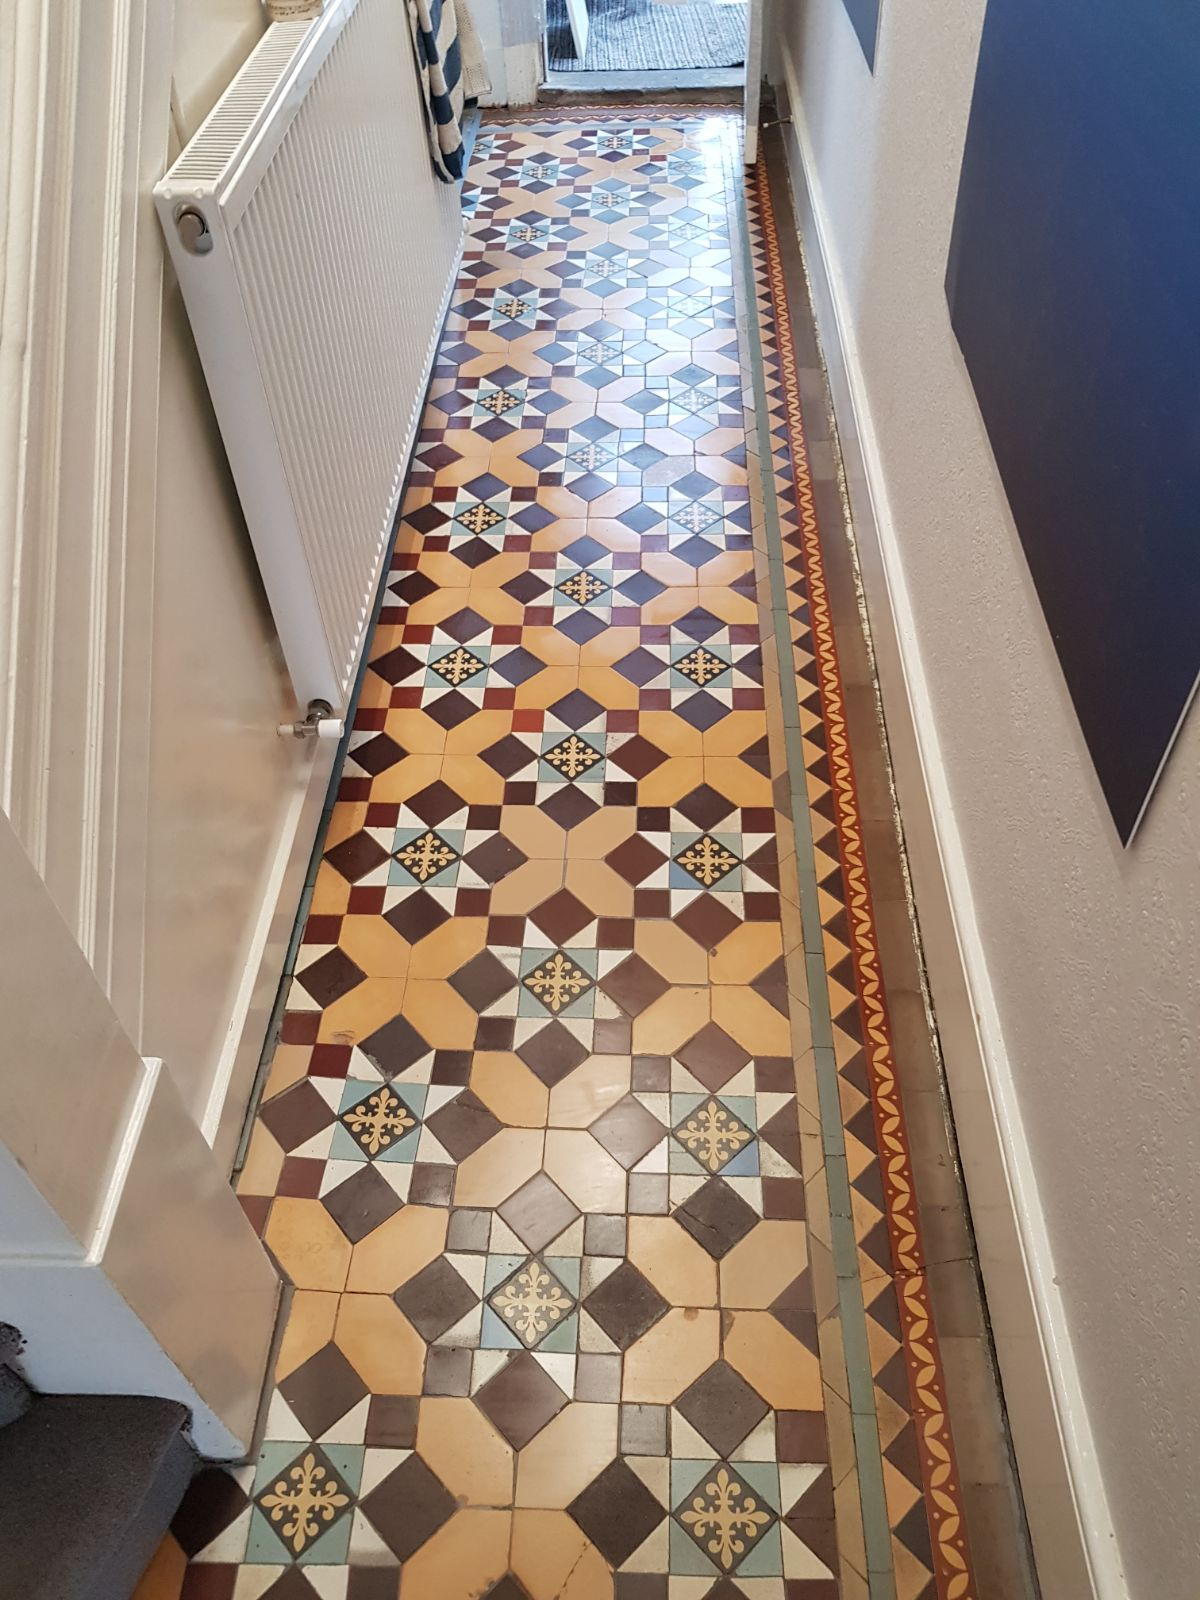 Edwardian Tiled Hallway Restoration